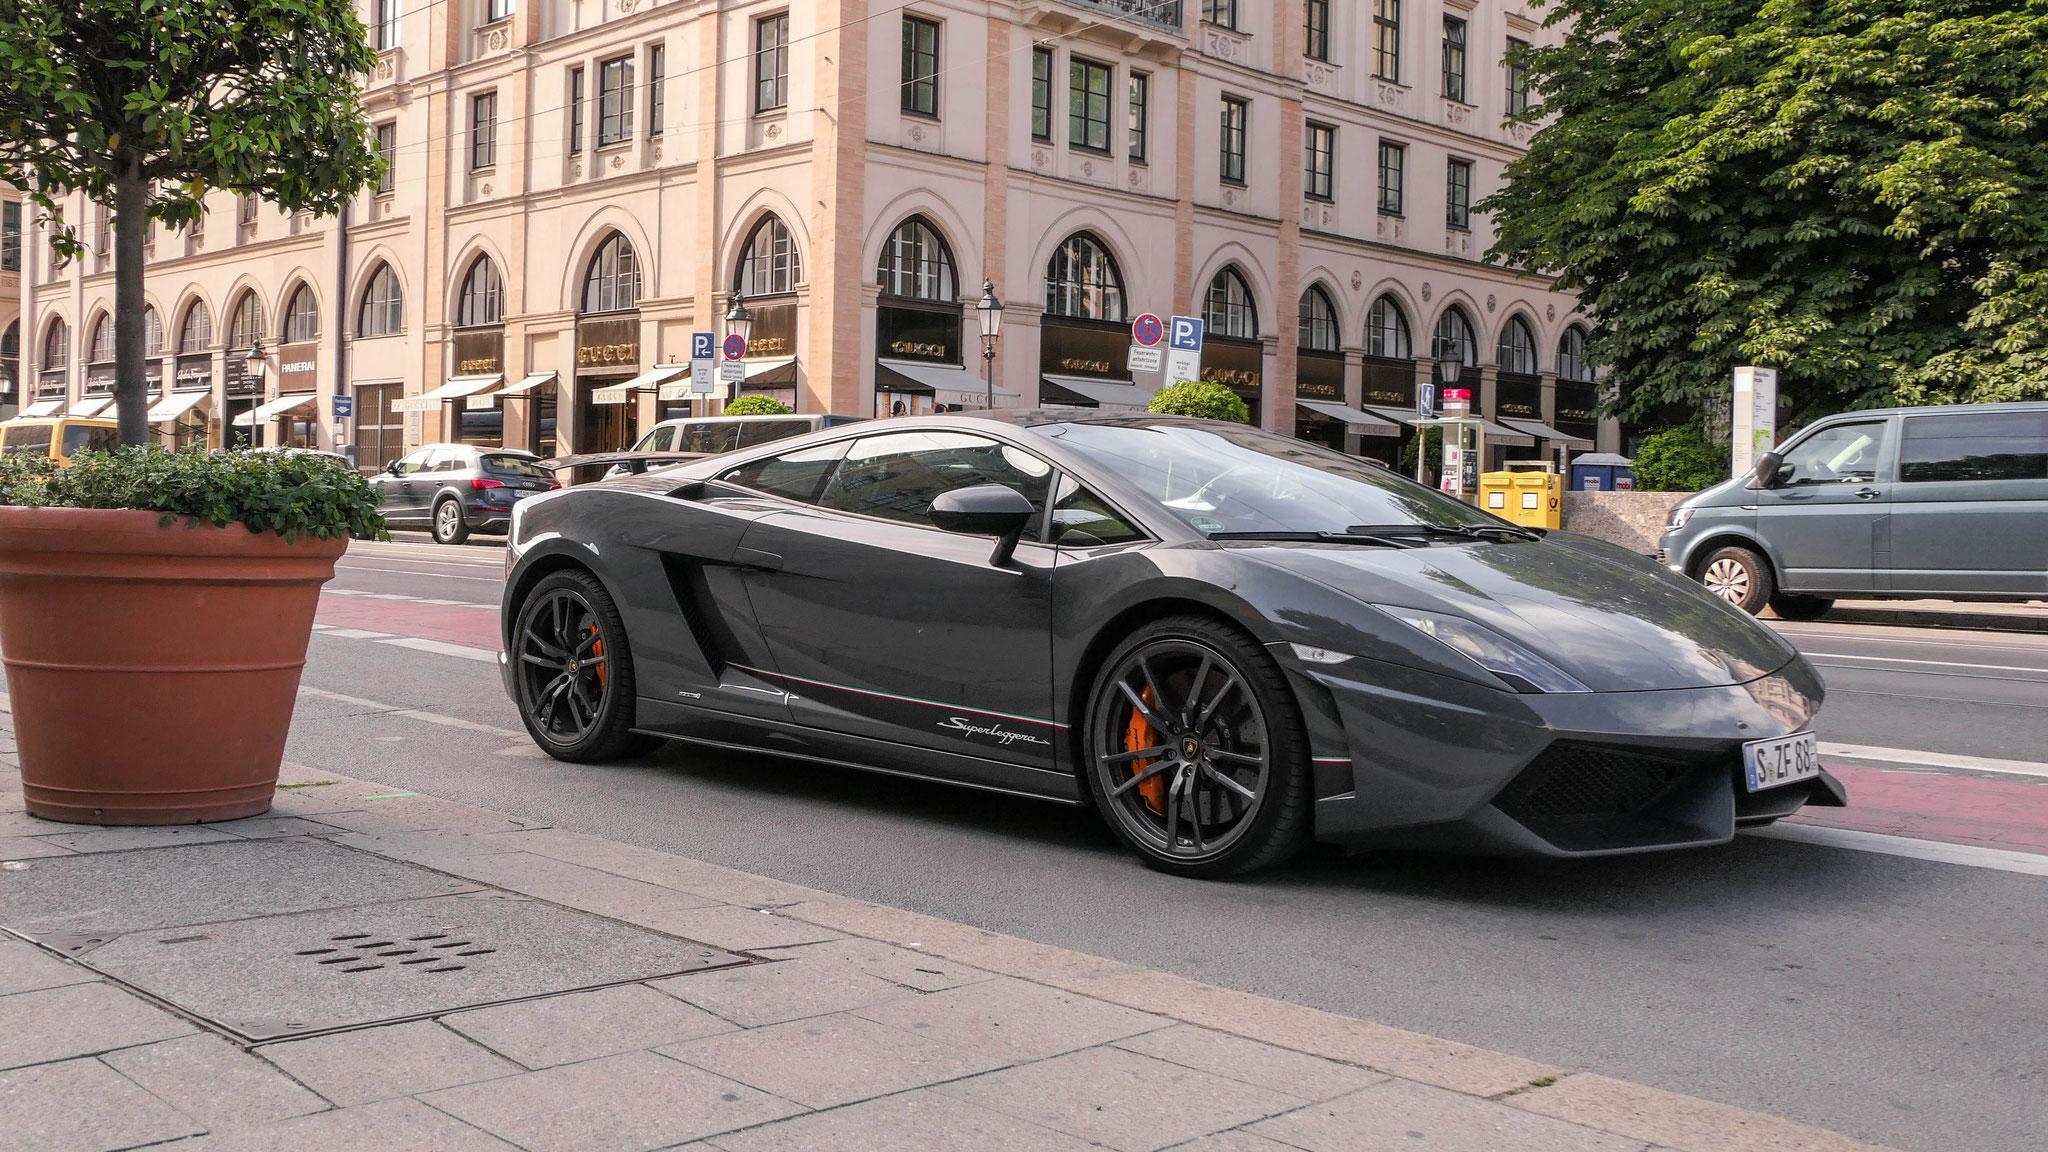 Lamborghini Gallardo Superleggera - S-ZF-88